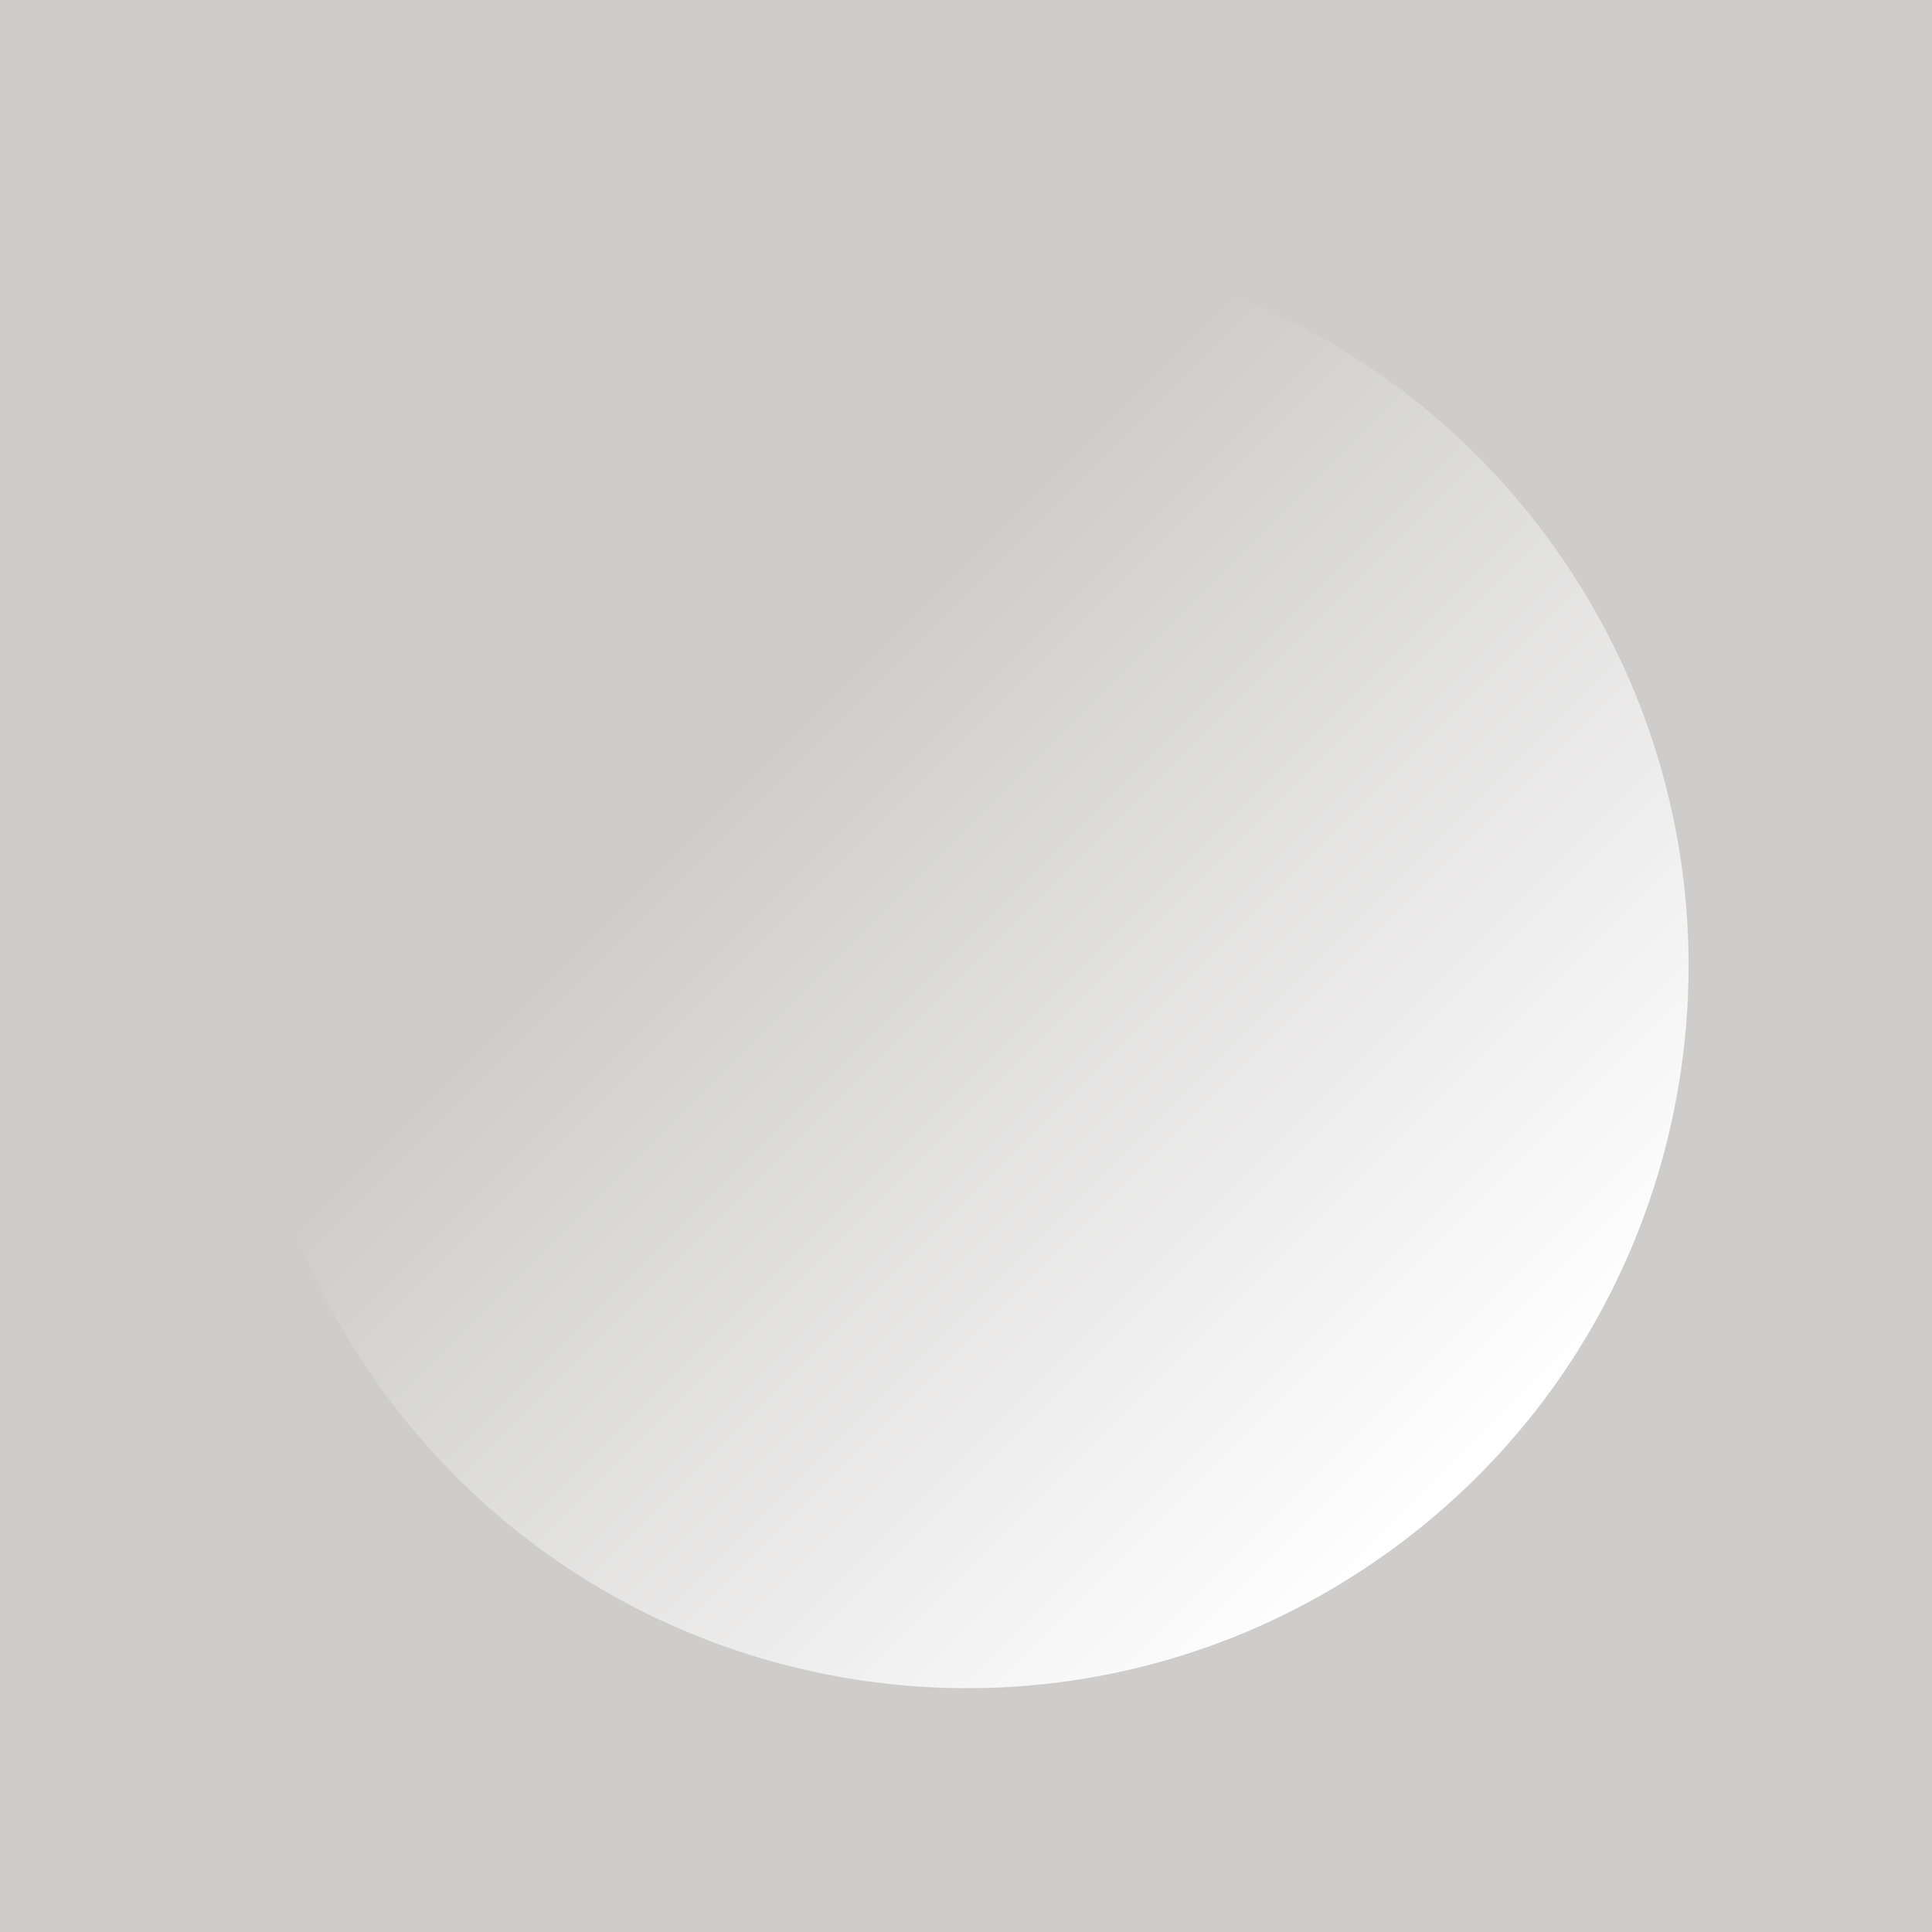 Pattern-22.jpg